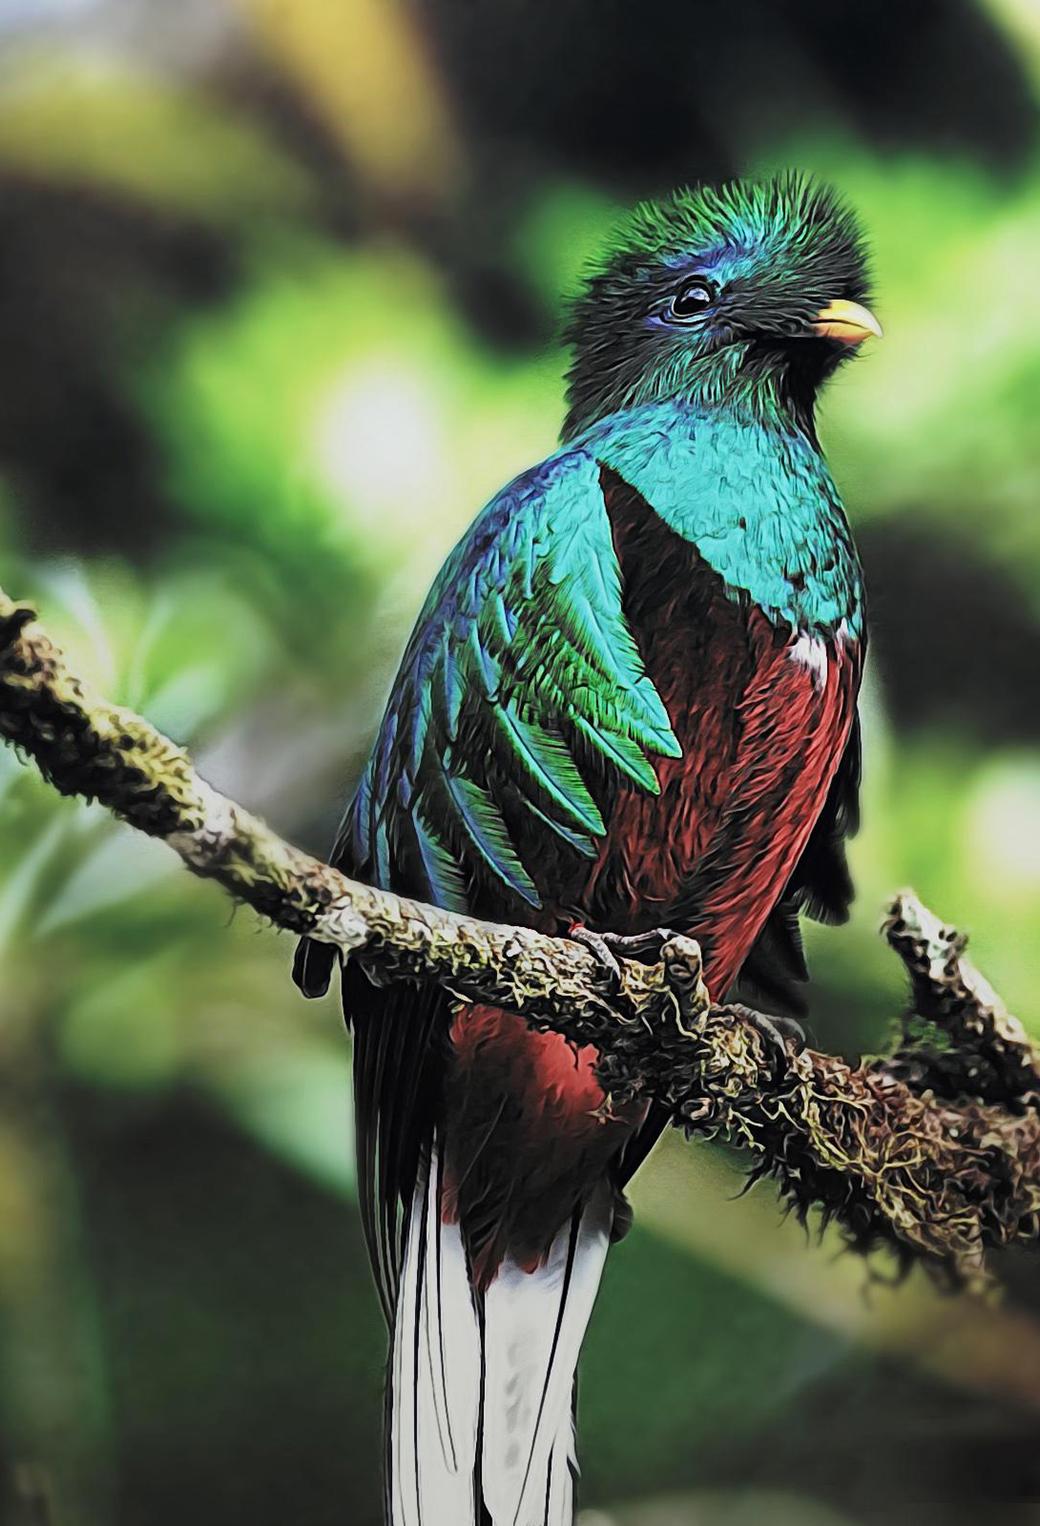 Quetzal Birds 3Wallppaers iPhone Parallax Quetzal Birds